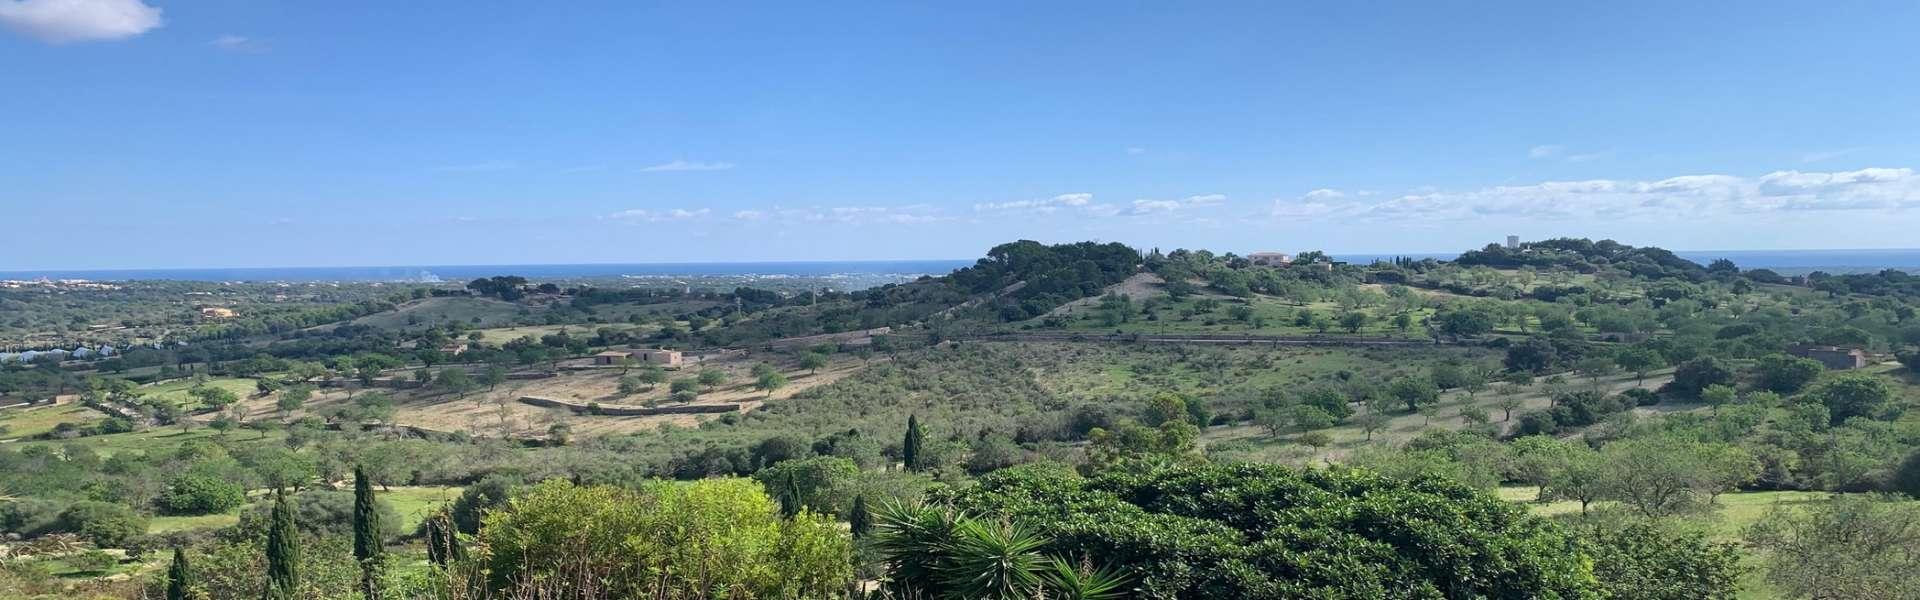 Alqueria Blanca - Country estate with fantastic views